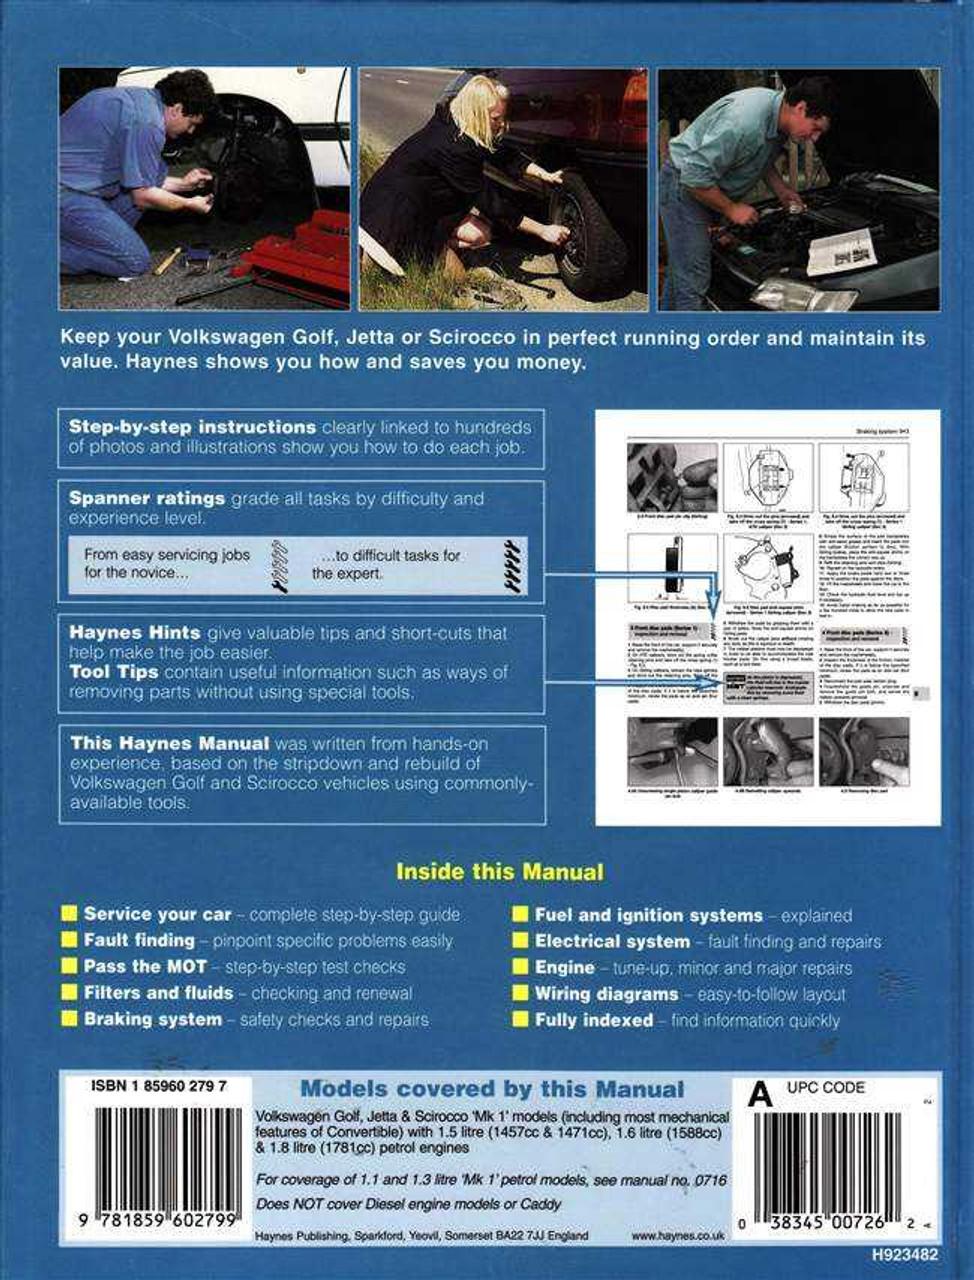 1984 Vw Scirocco Ignition Wiring Diagram   Manual e-books  Scirocco Wiring Diagram on vw vortex scirocco, old vw scirocco, volkswagen scirocco,